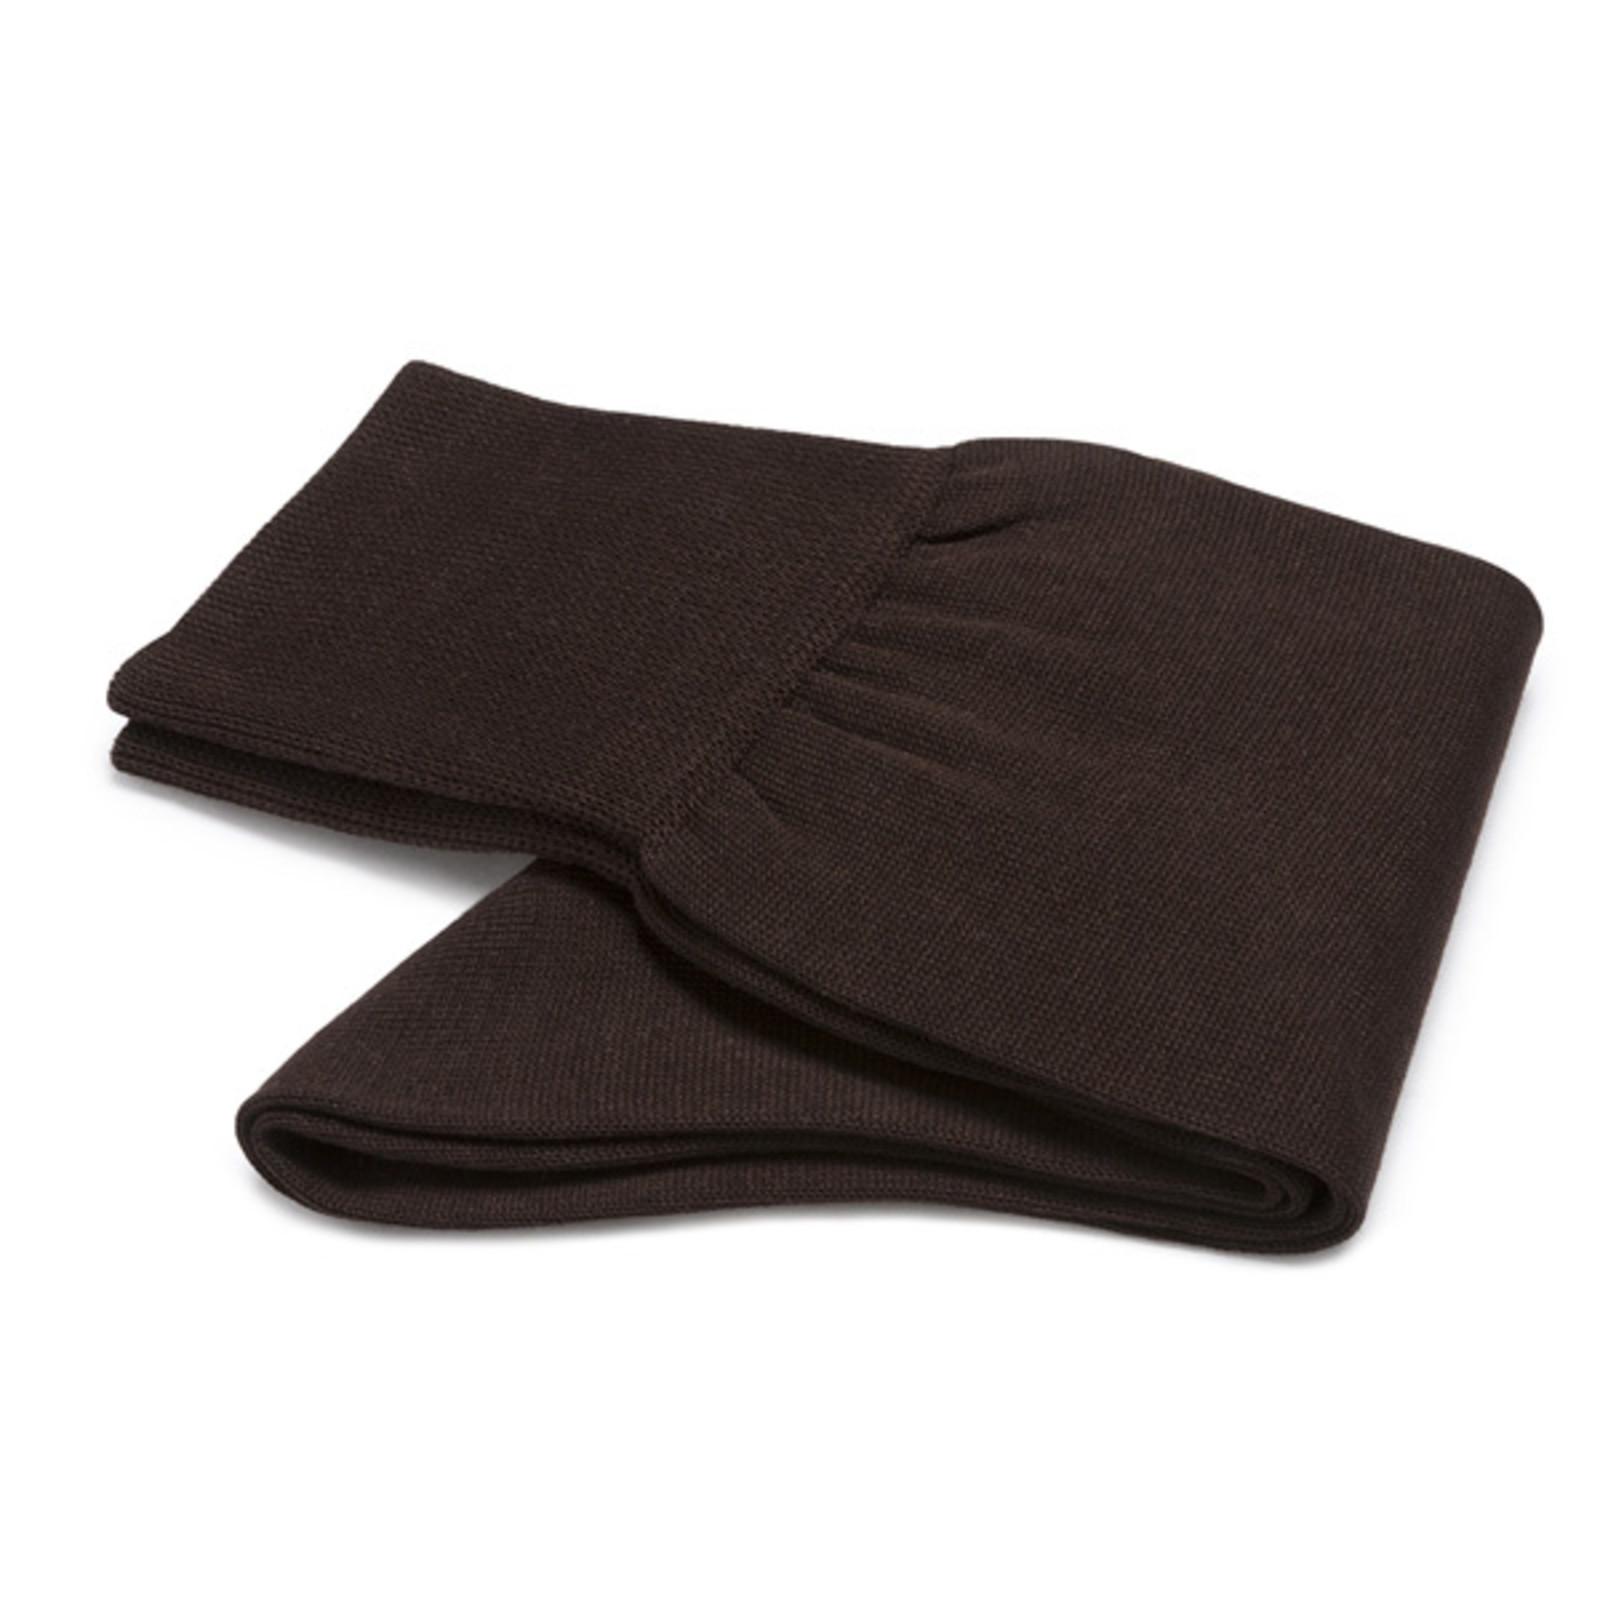 Carlo Lanza Braune Socken Baumwolle